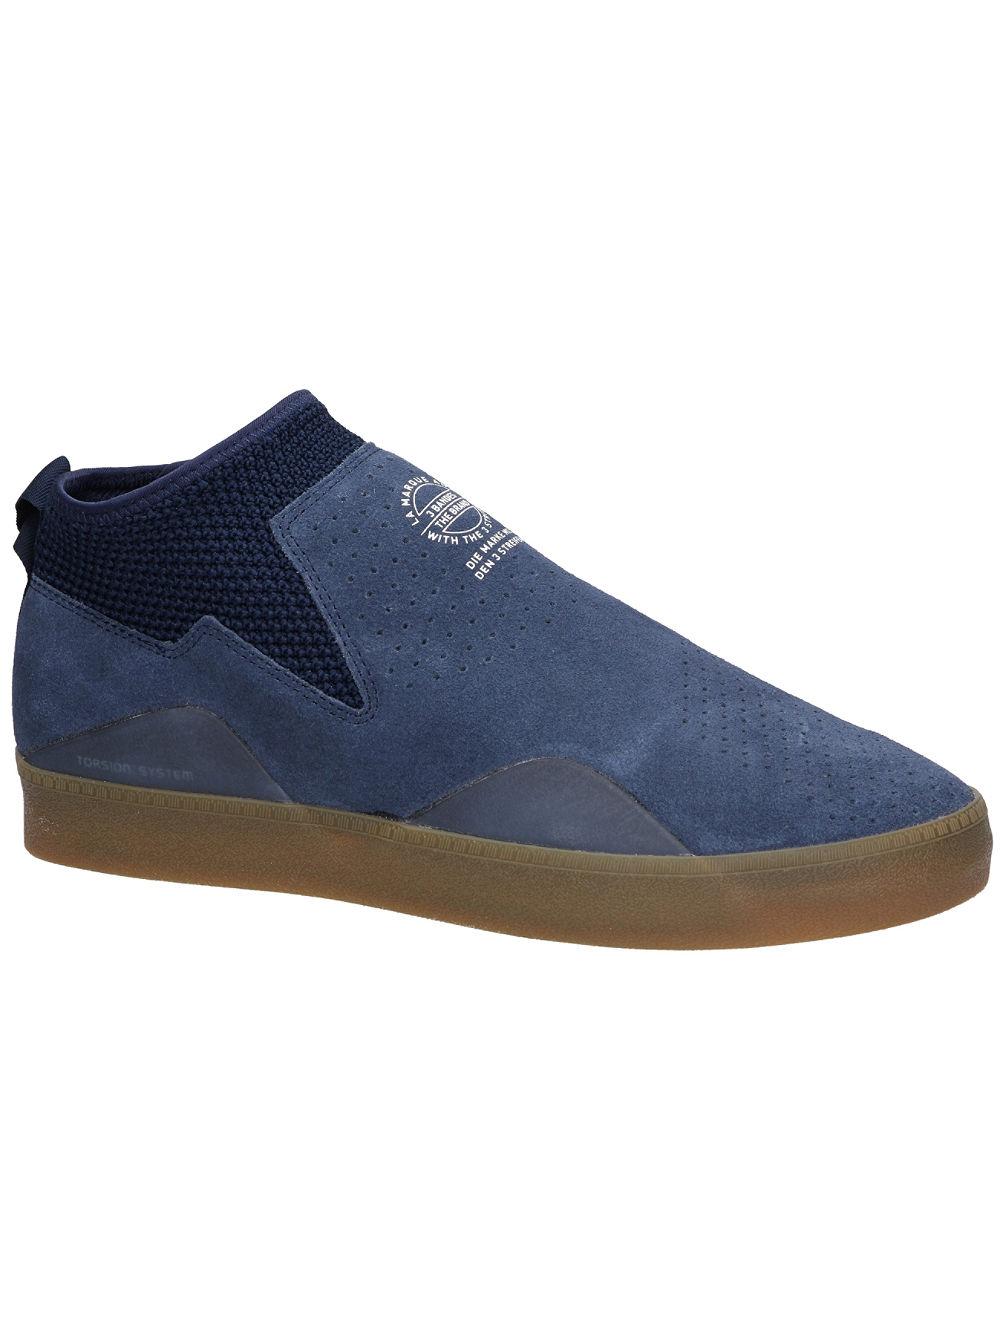 992dc9f18 Buy adidas Skateboarding 3ST Slip-Ons online at Blue Tomato